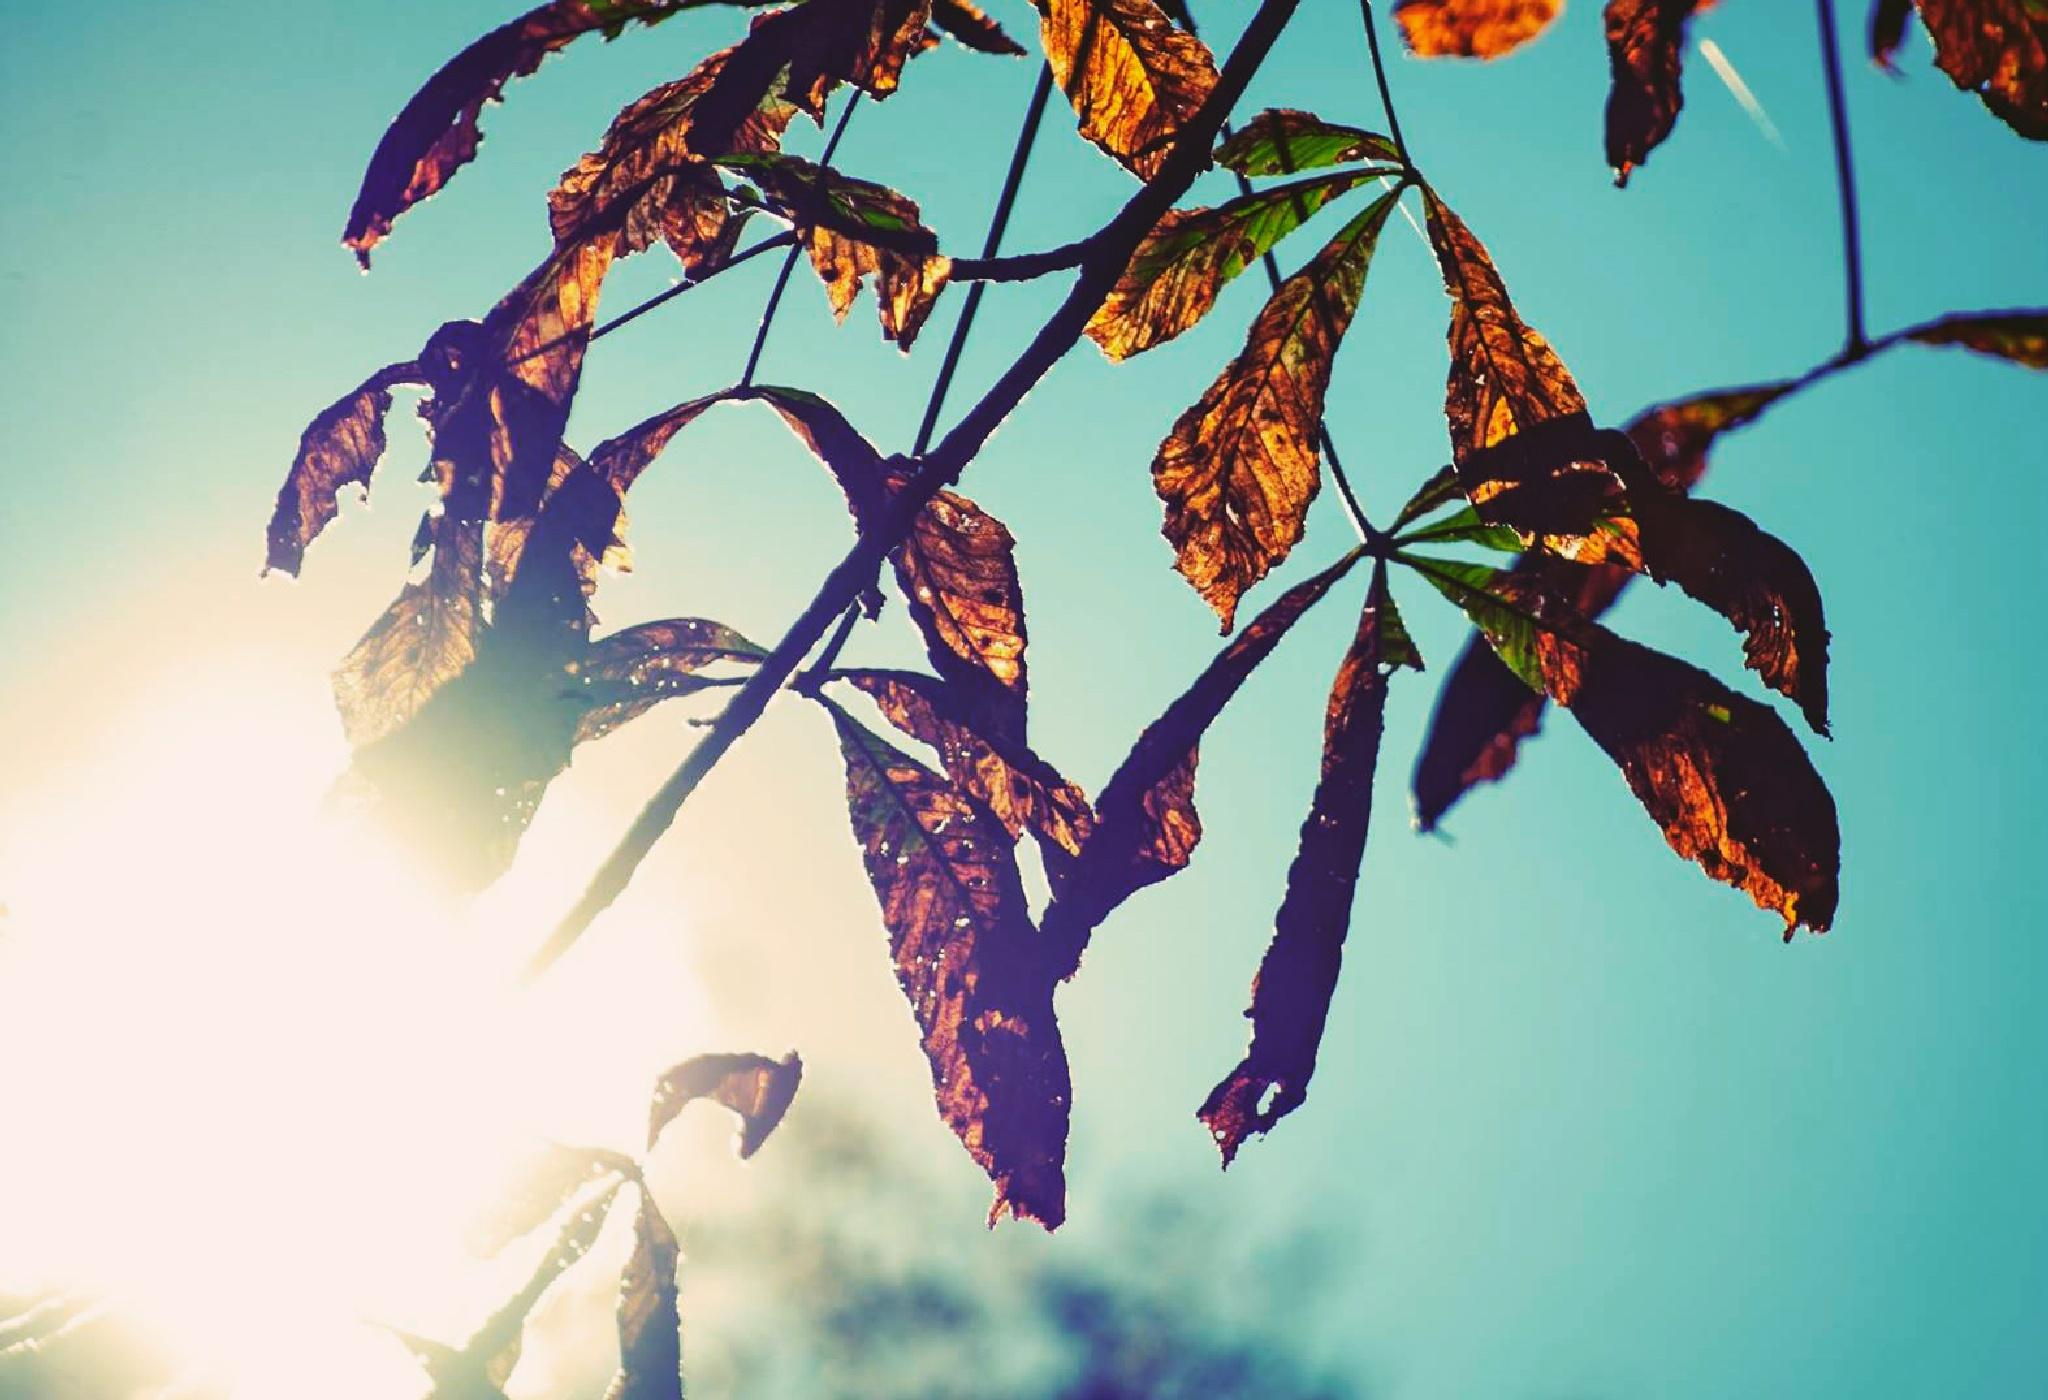 Brown leaves by Gudan Tadej